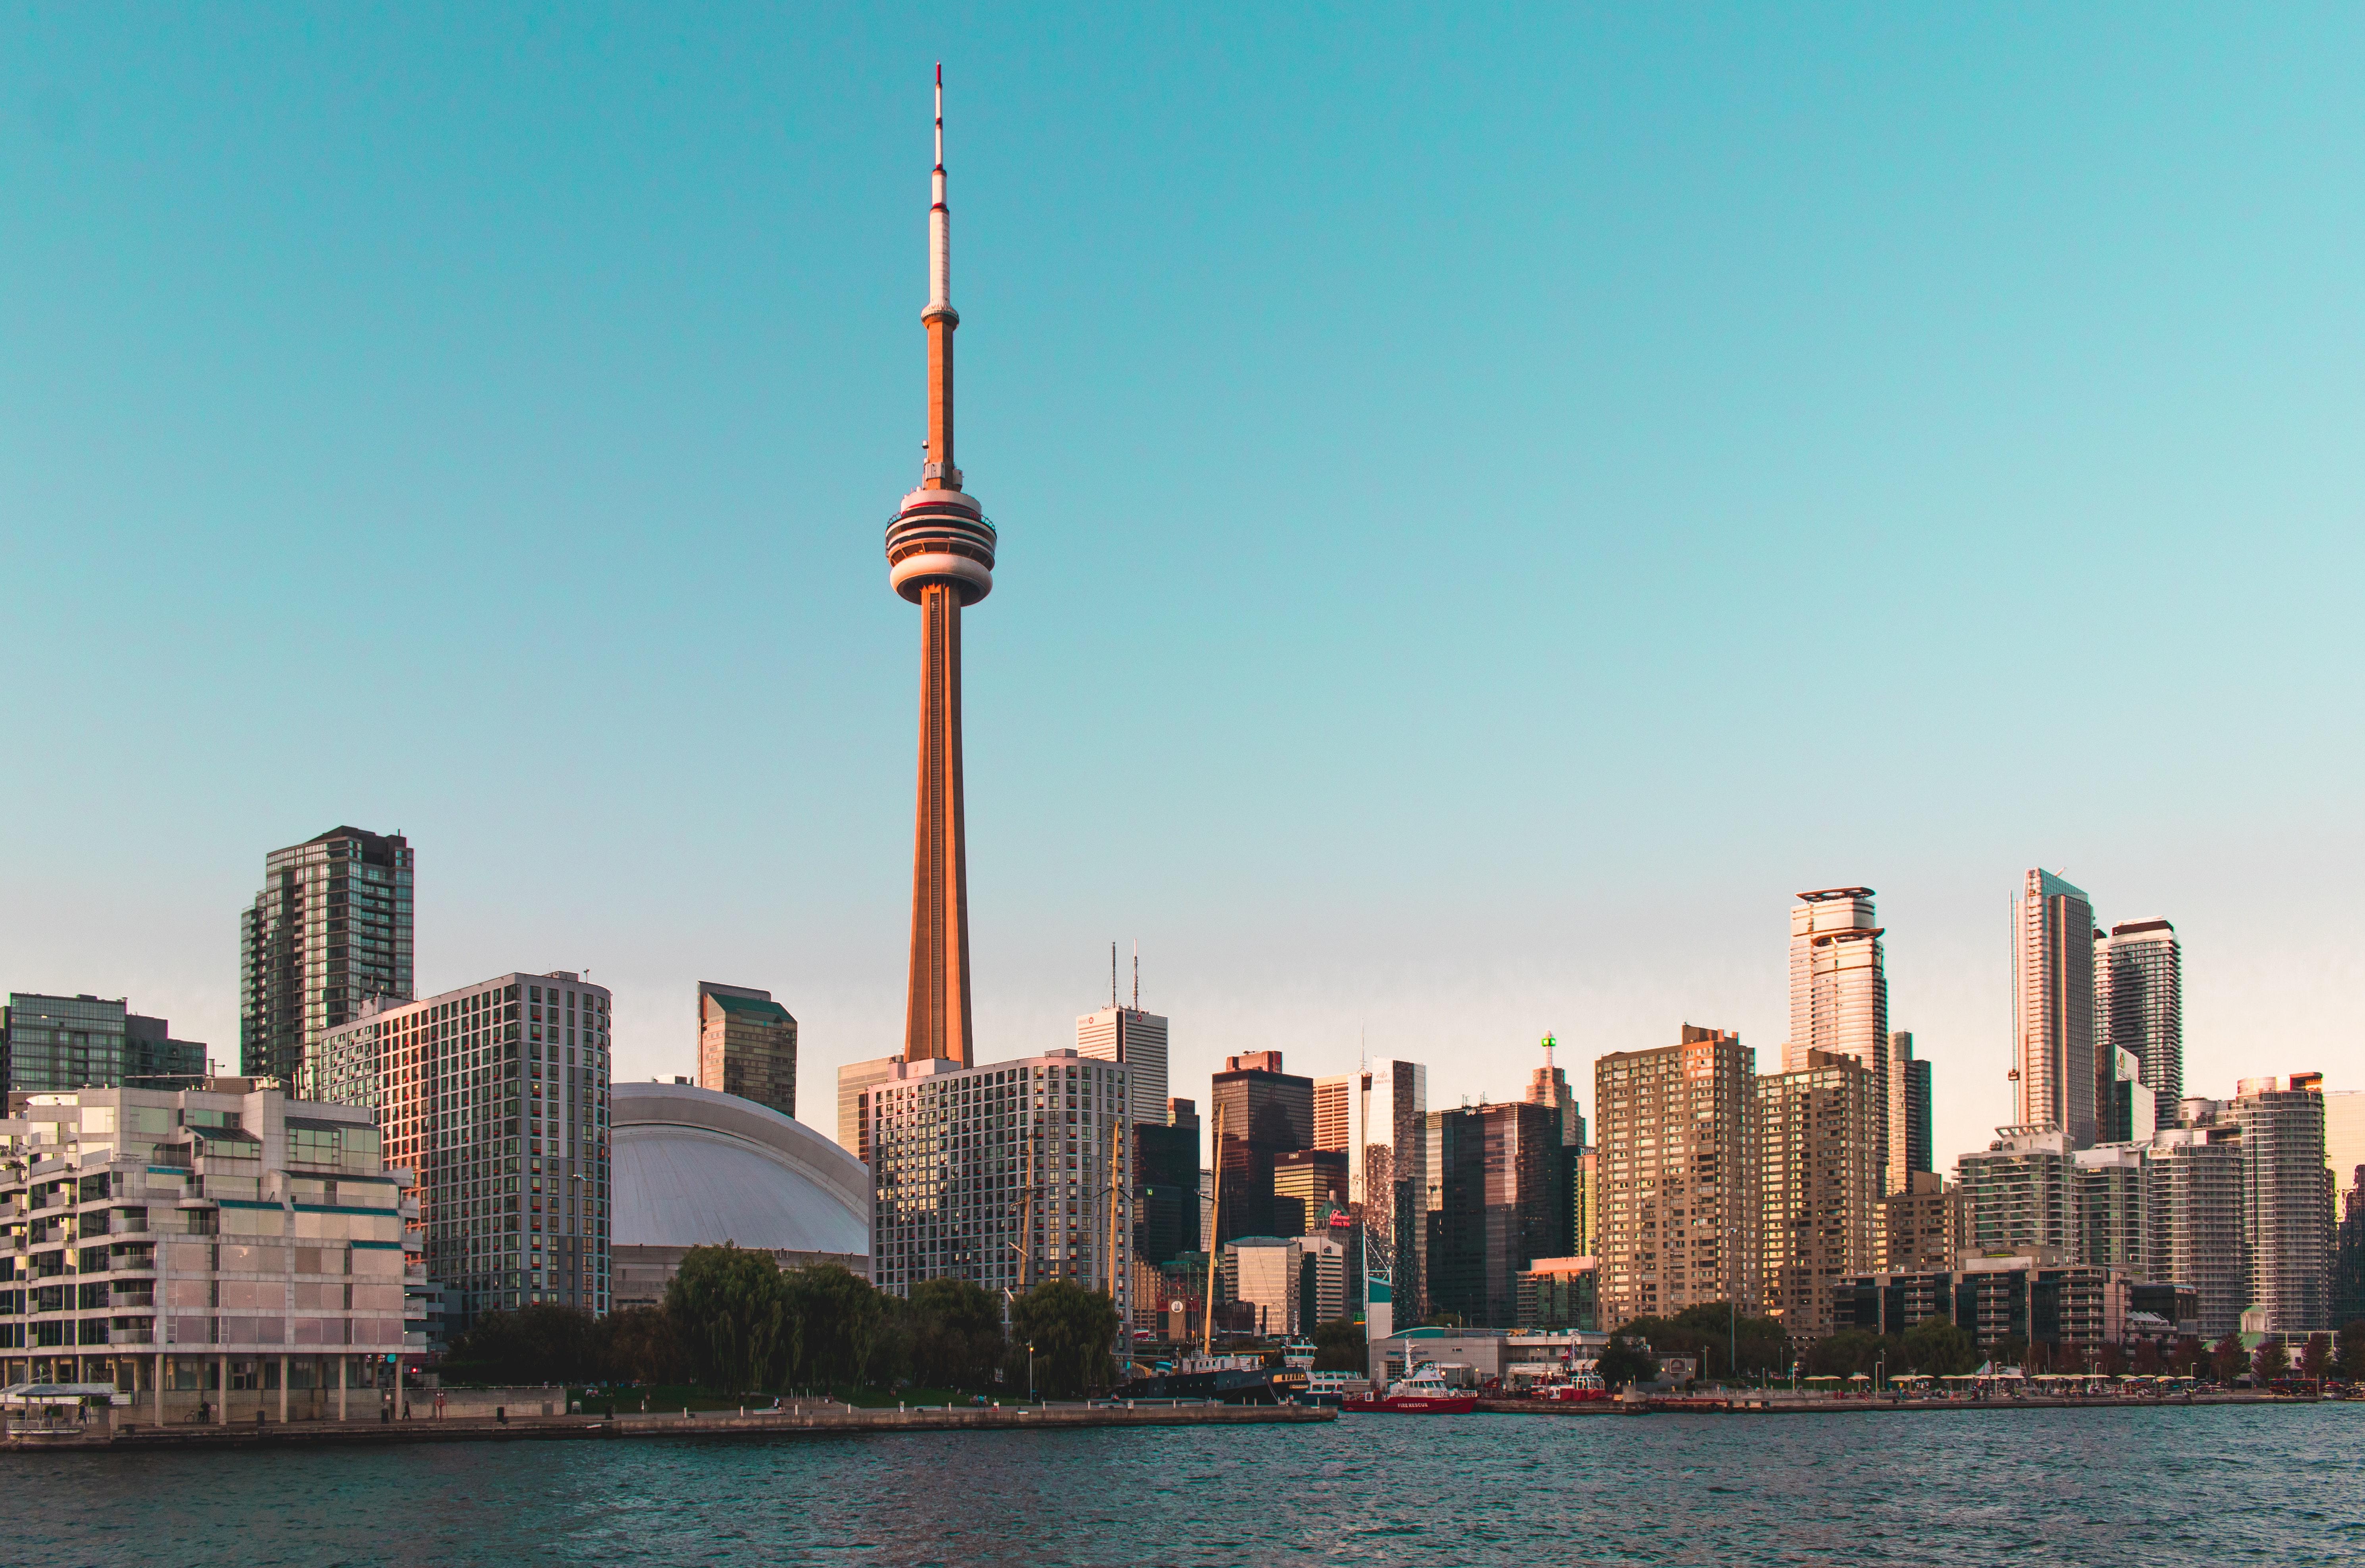 Toronto (YYZ)